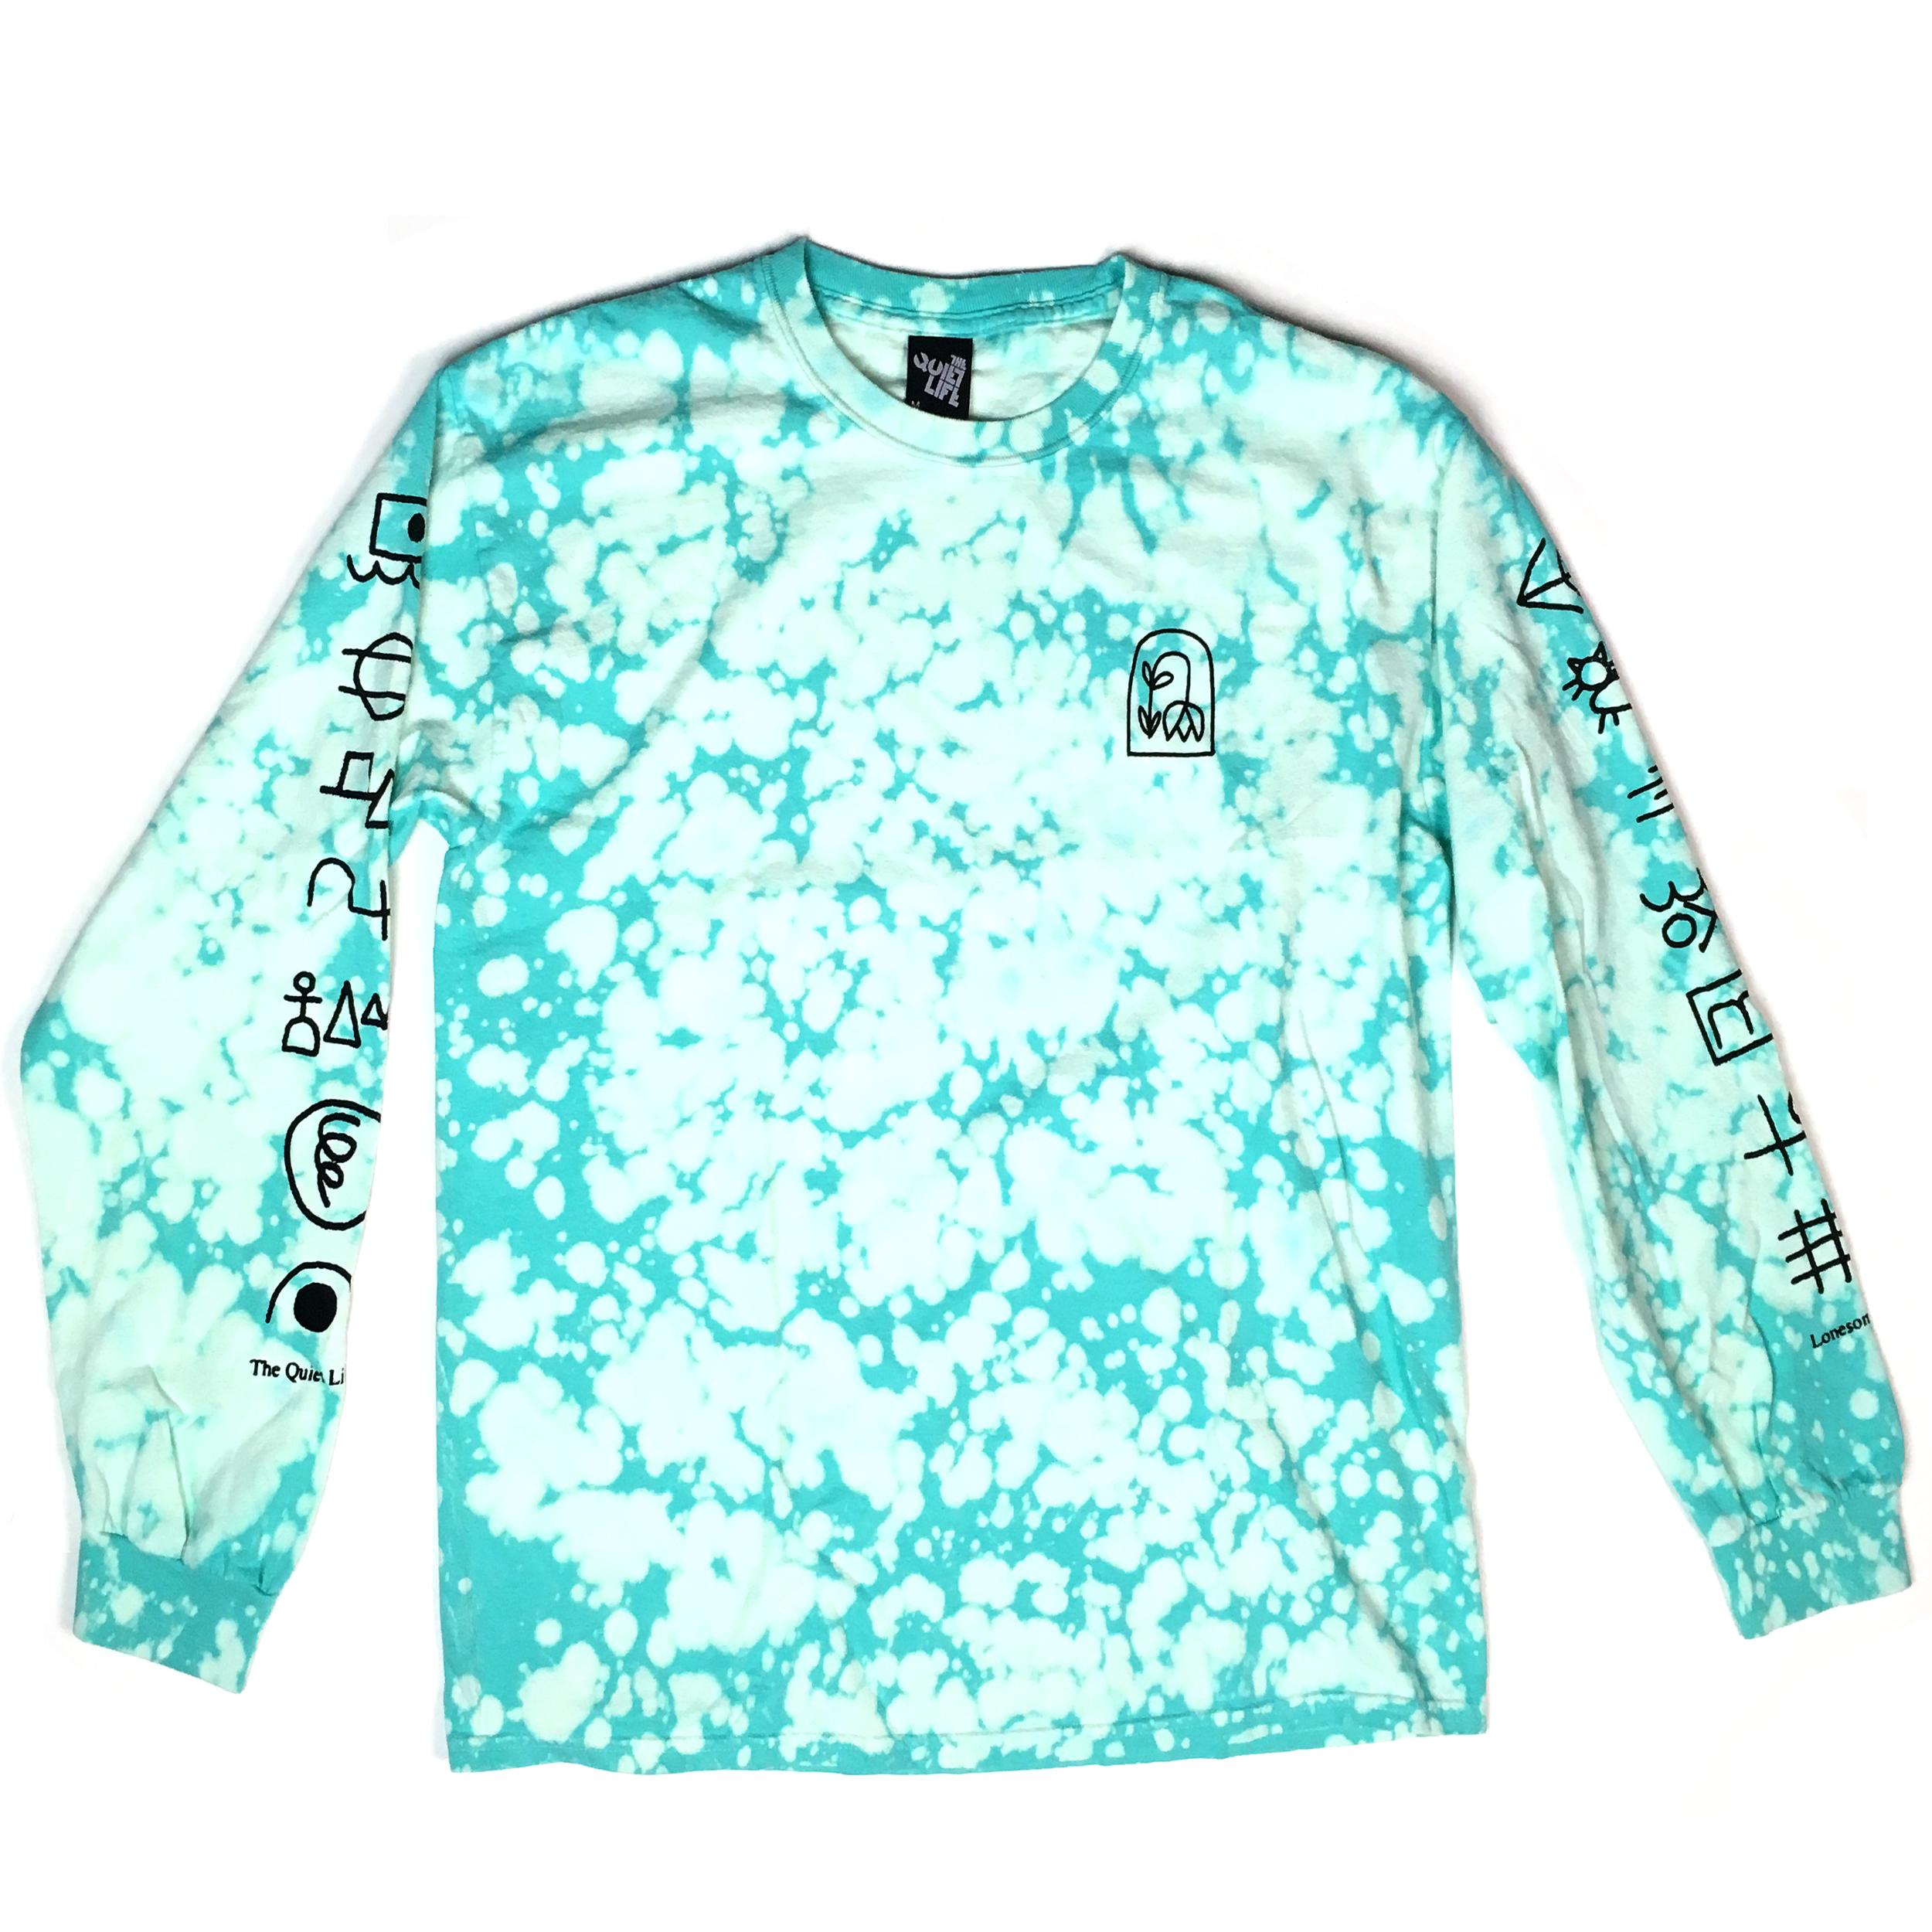 Lonesome Rose X Quiet Life Hobo Code Tie Dye Longsleeve T Shirt